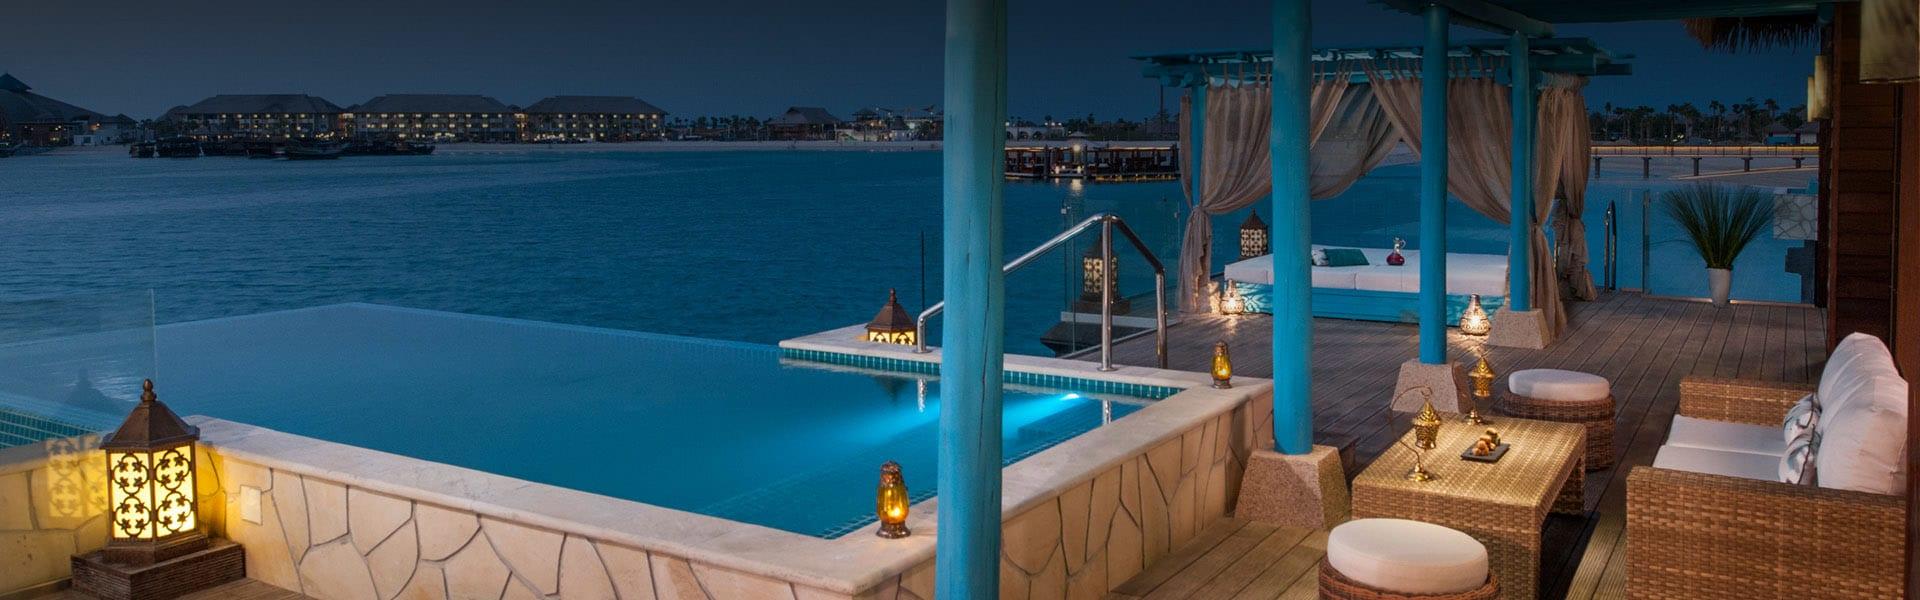 Doha Luxury Hotels | Over Water Villas in Doha at Banana Island Resort